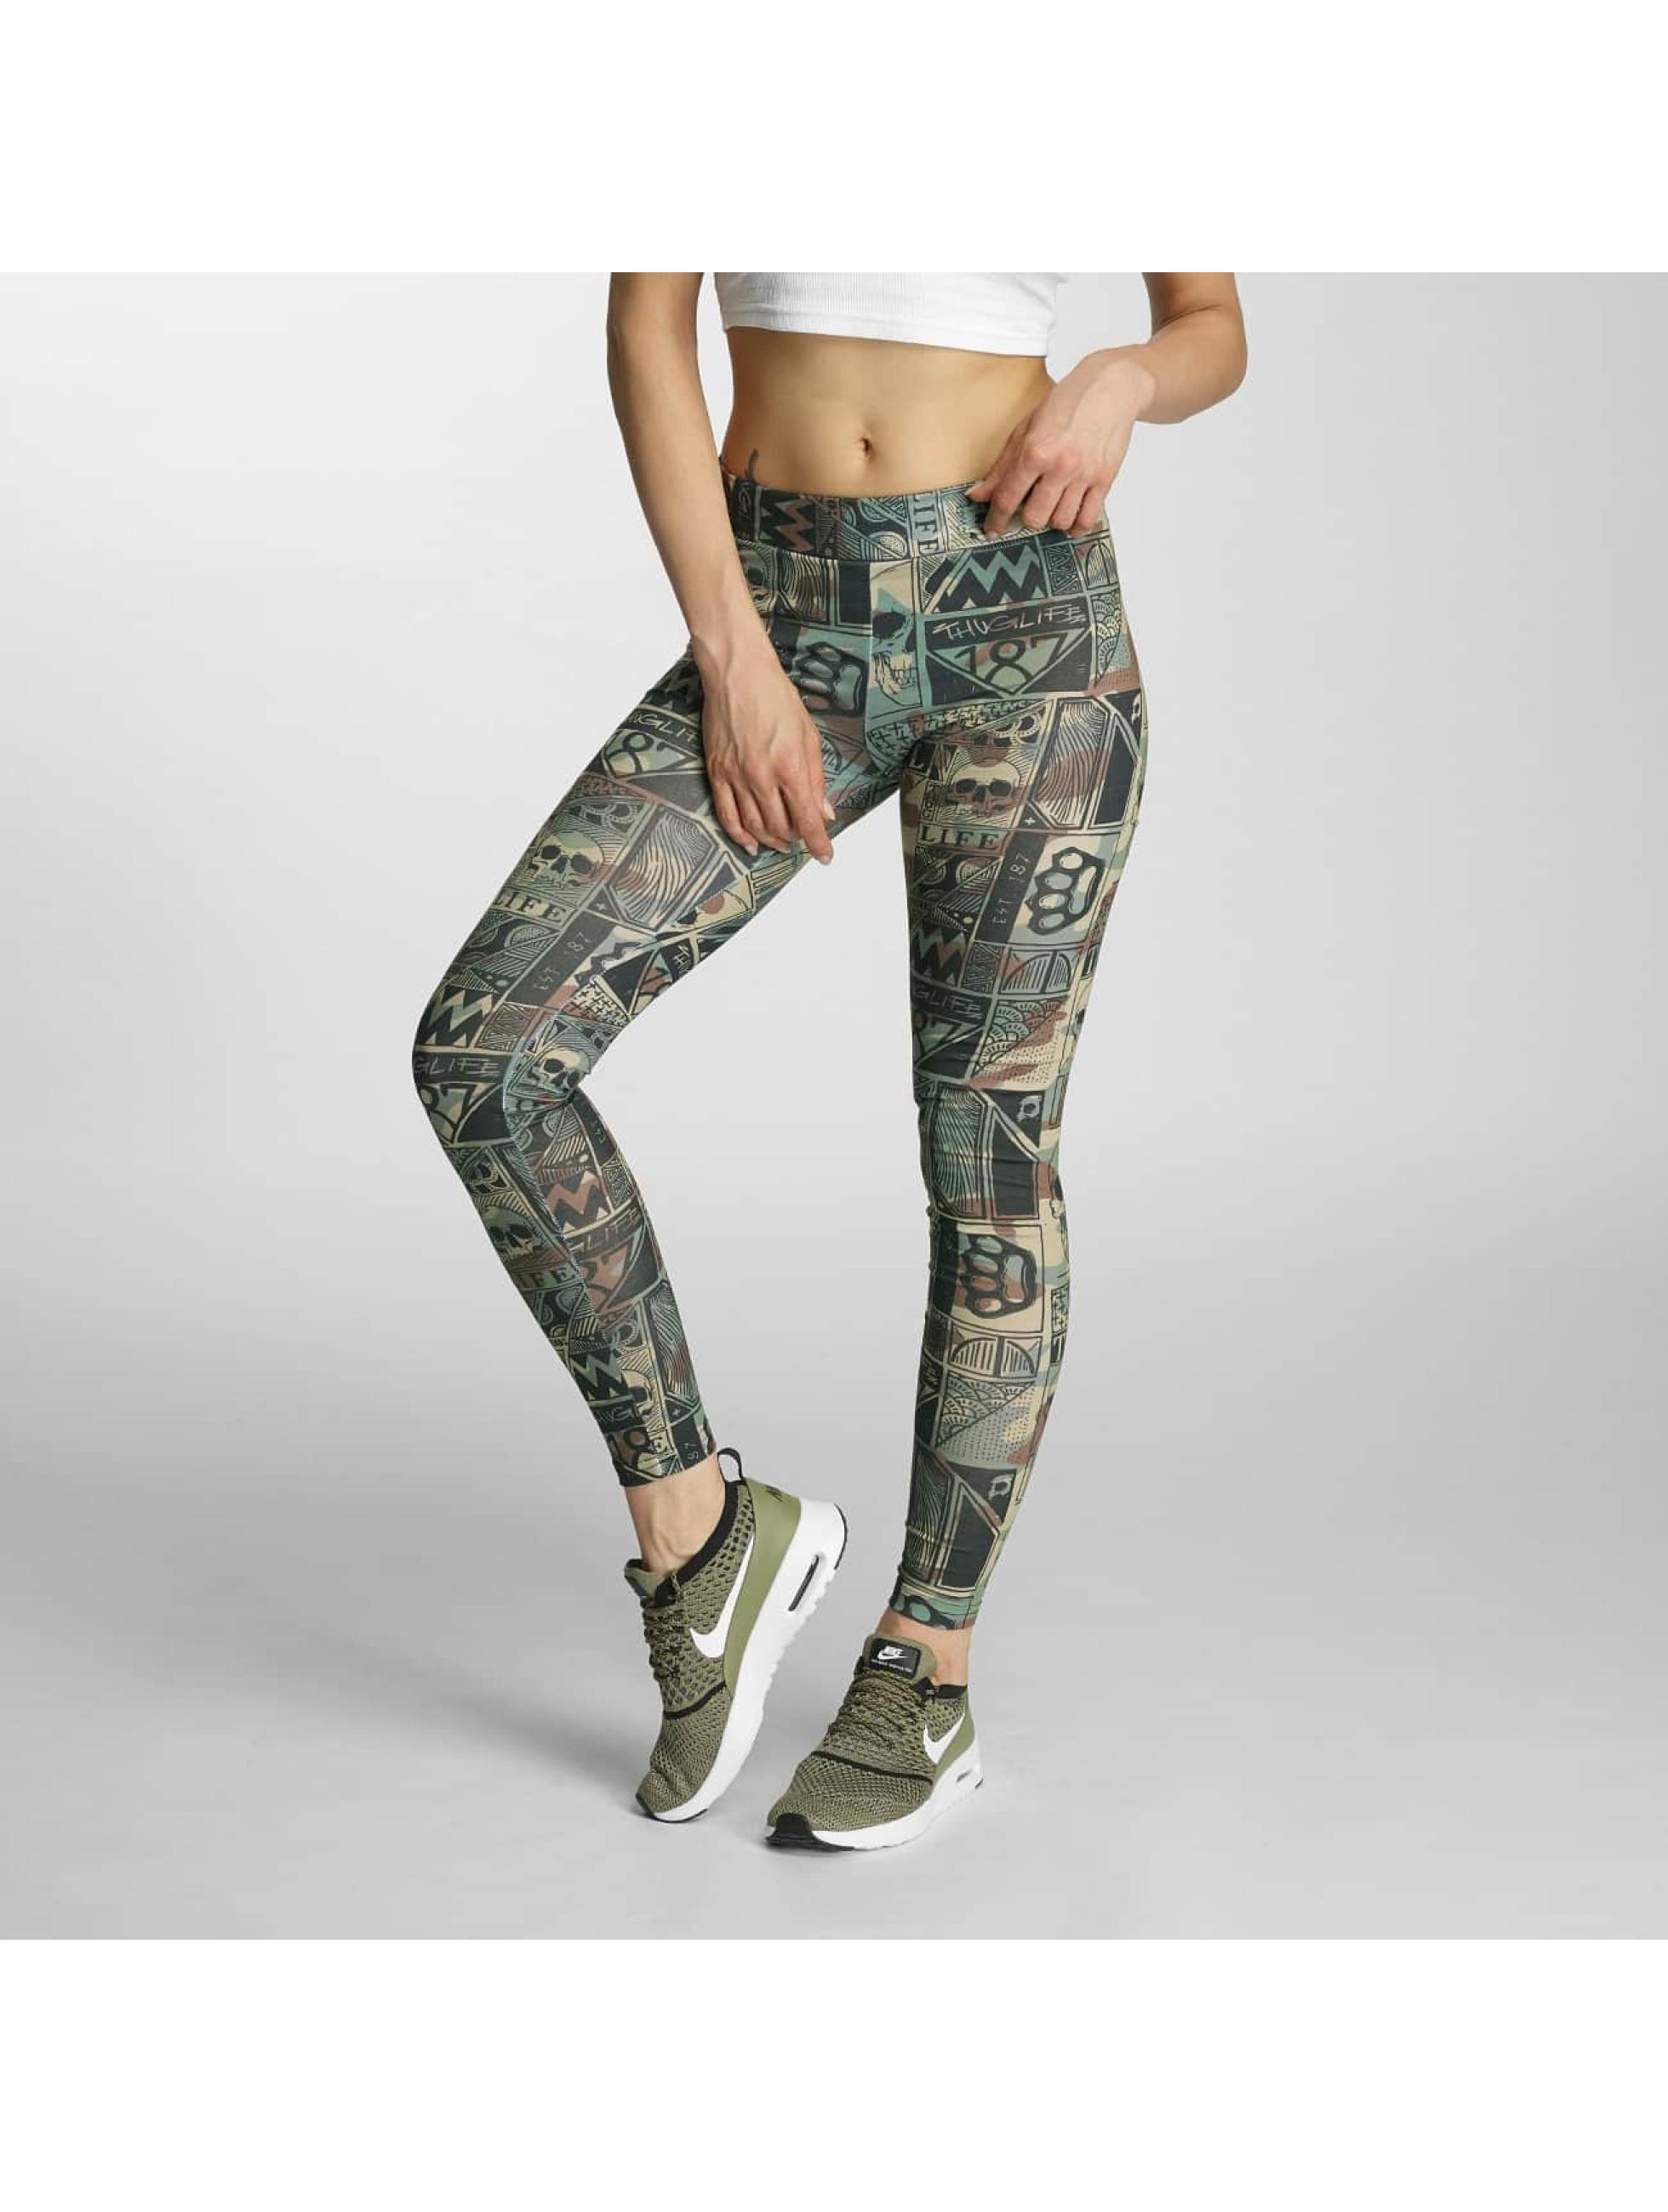 Thug Life / Legging/Tregging Broon in camouflage XXS